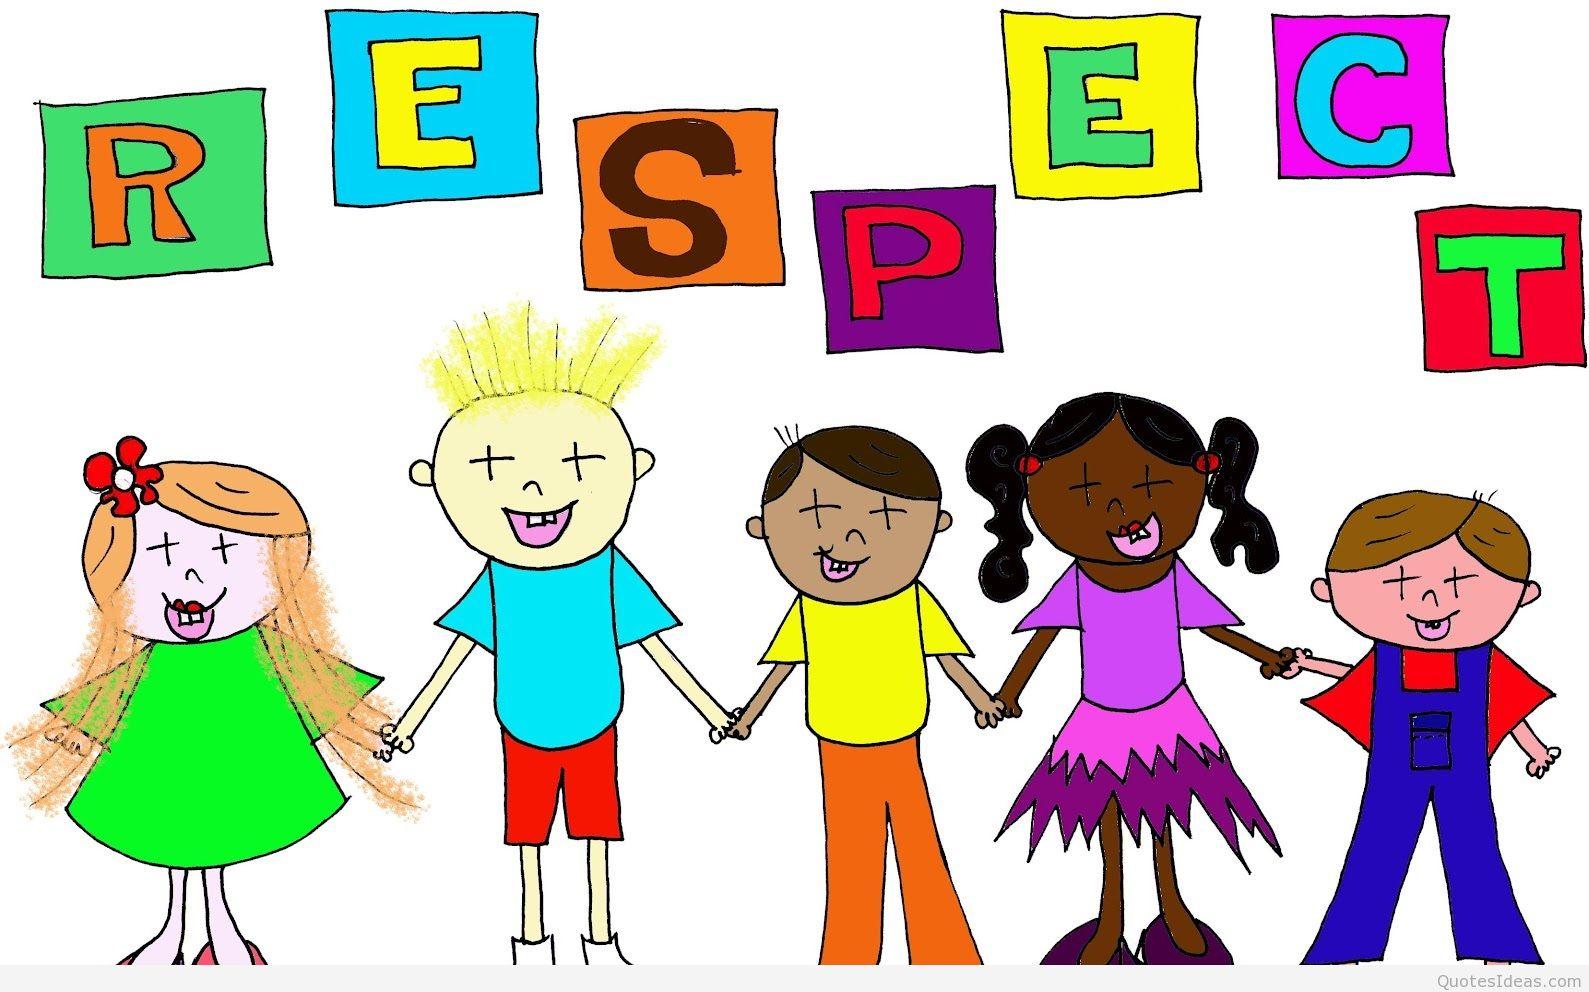 Respect logo meopham community. Child clipart respectful